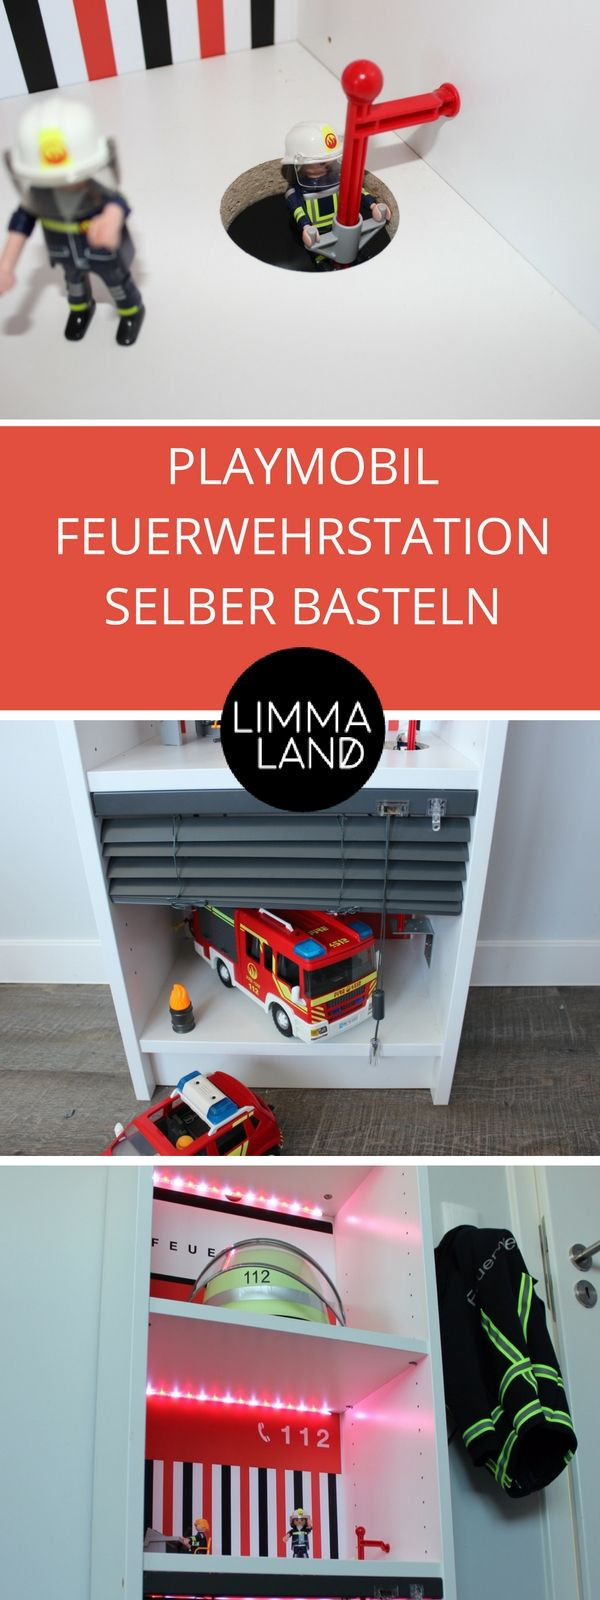 Feuerwehrstation Selber Basteln Kinderzimmer Pinterest